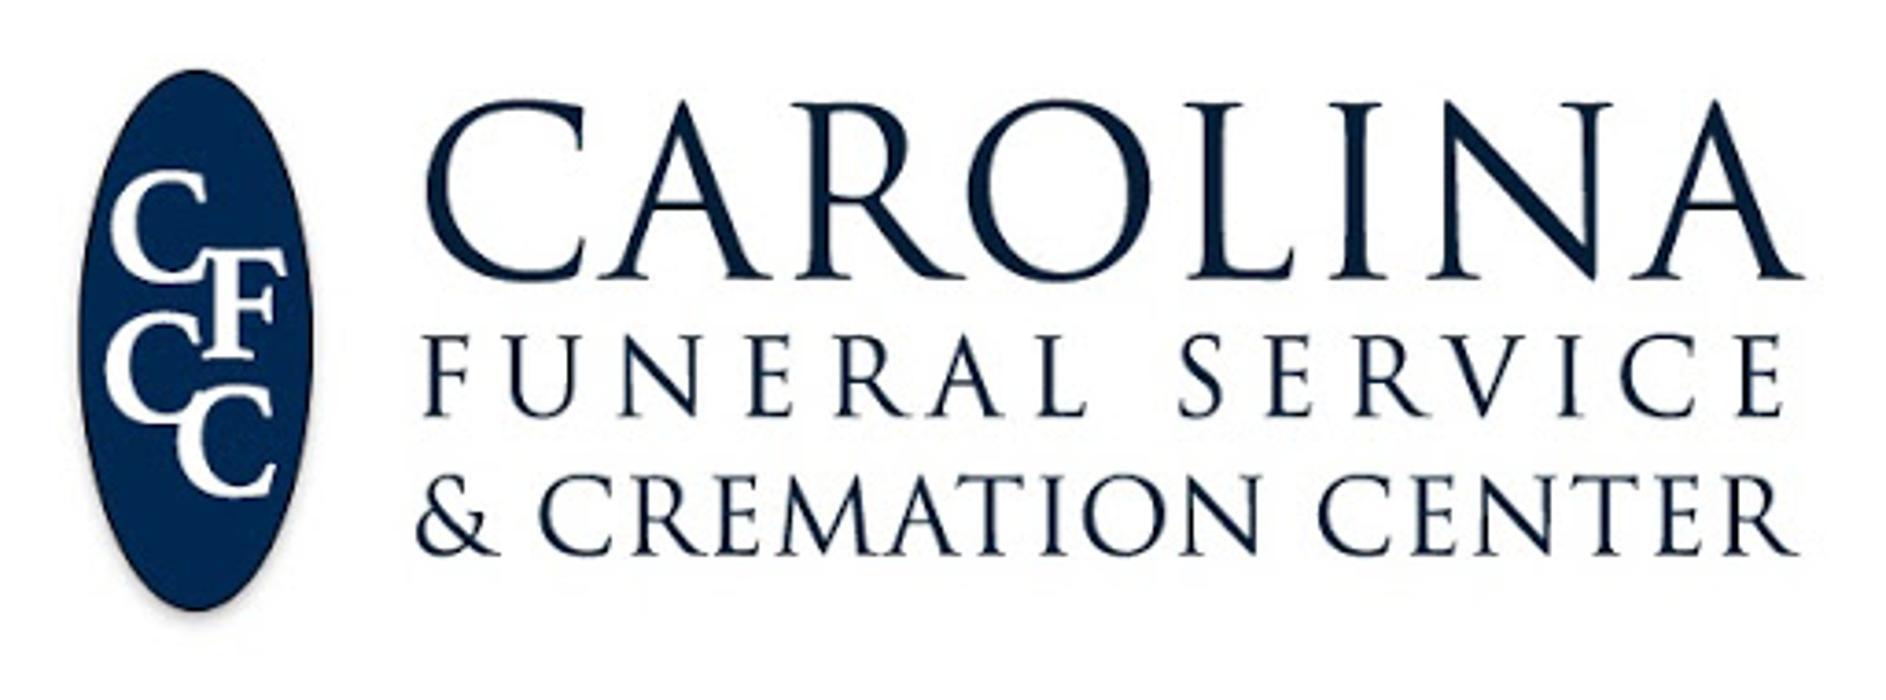 Carolina Funeral Service & Cremation Center - Charlotte, NC